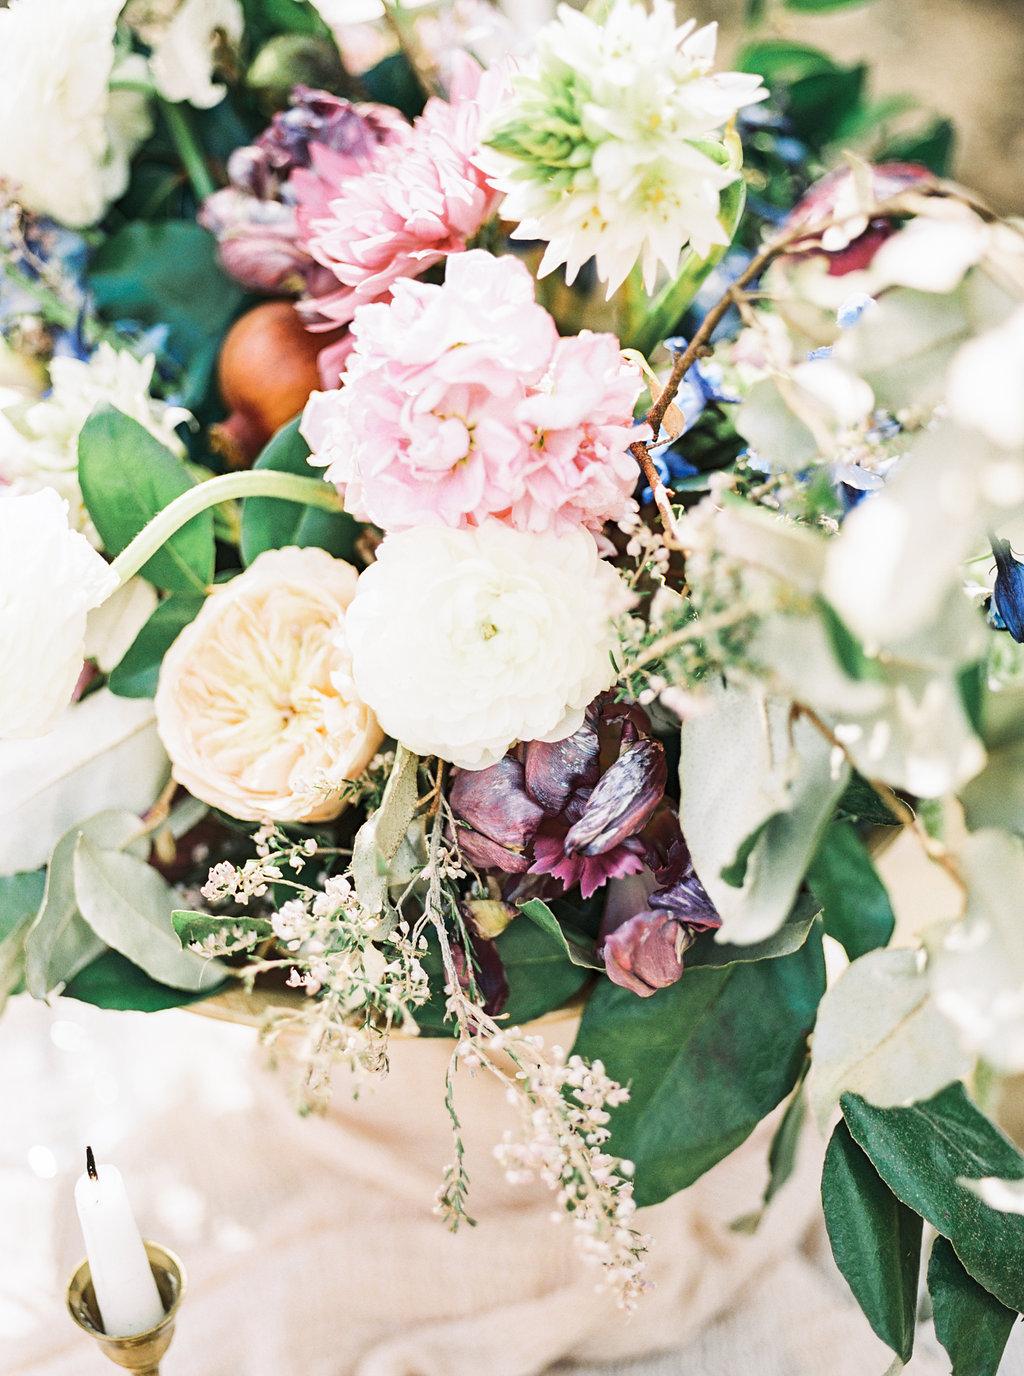 Sarah Ingram film colorful tabletop 1